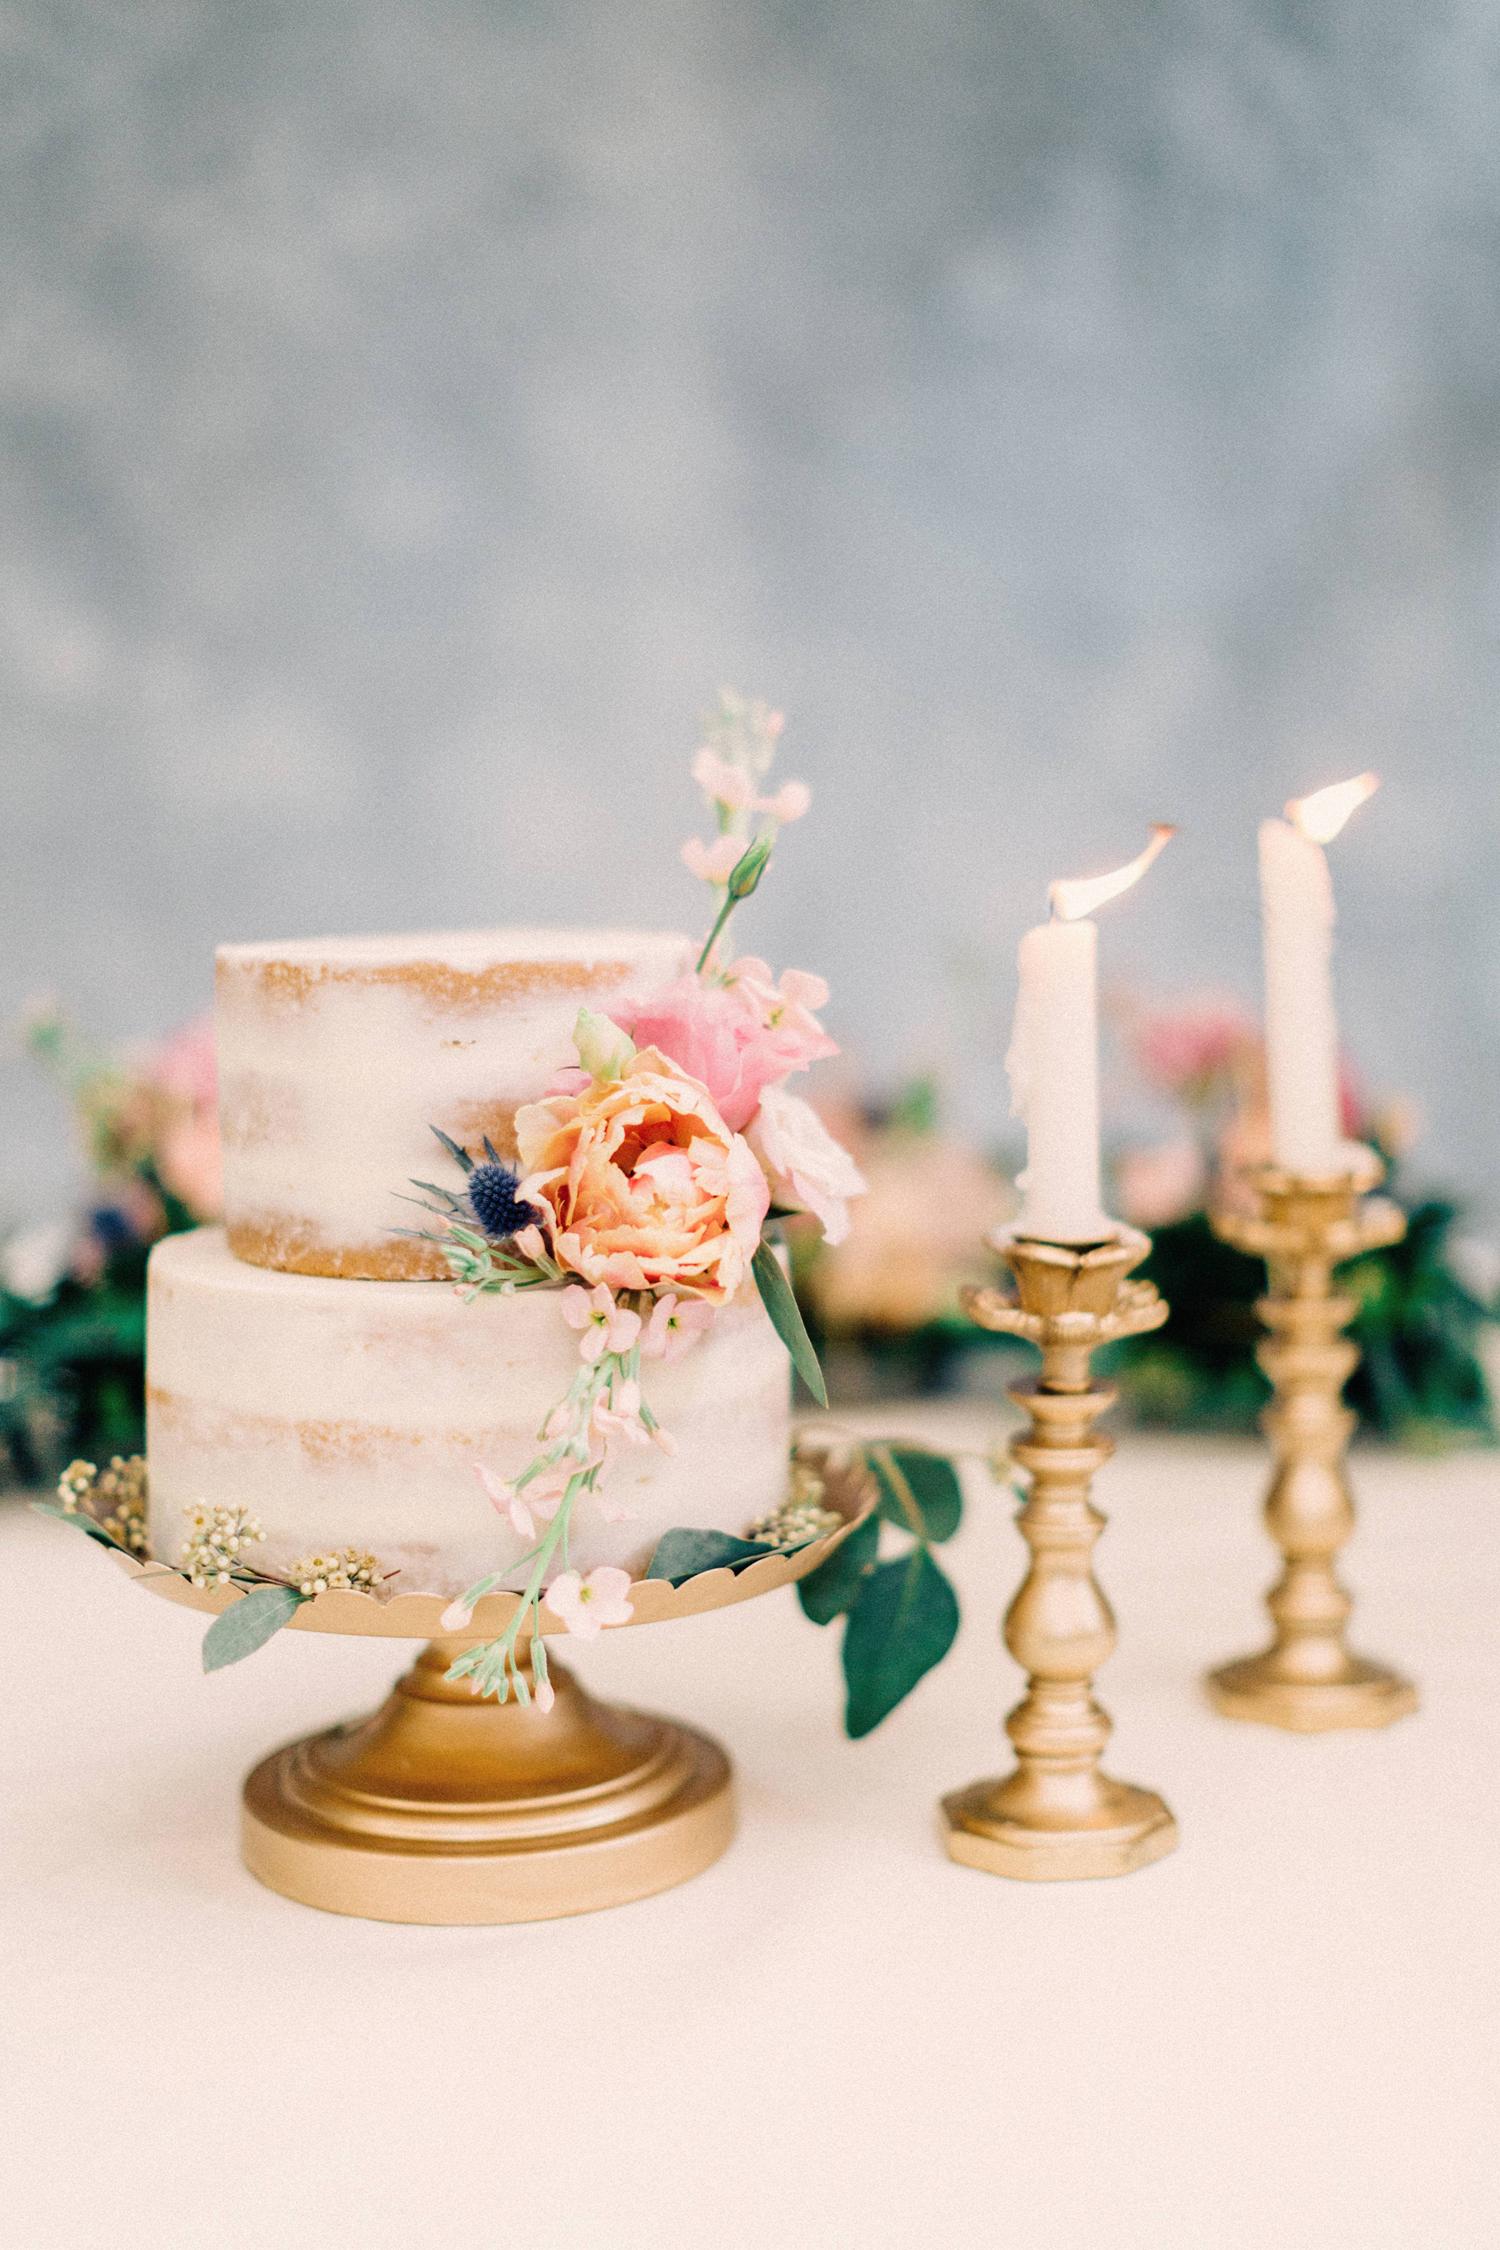 005-alaamarzouk-alaamarzoukphotography-mcallenweddingphotographer-alaa-marzouk-mcallen-mission-wedding-texas-venue-photography-wedding-california-bride-bridal-engagement-austin-elopement.jpg